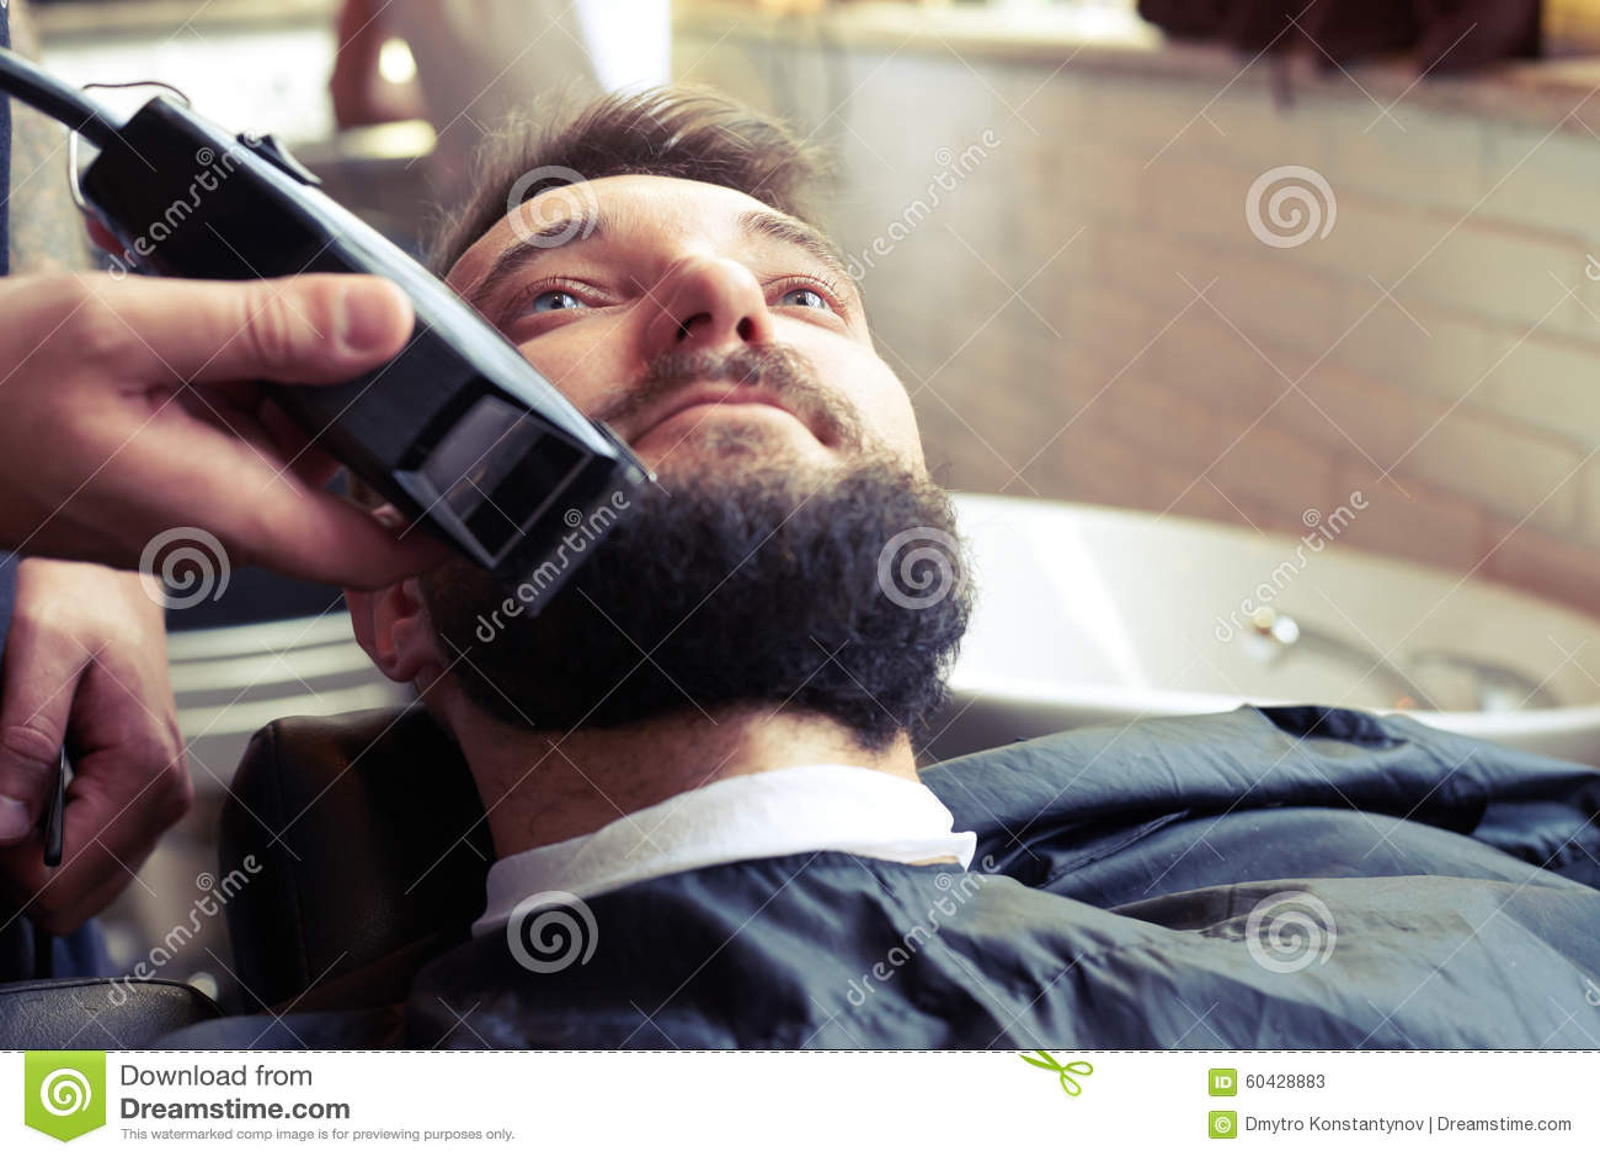 barber shaving beard stock photo image 60428883. Black Bedroom Furniture Sets. Home Design Ideas